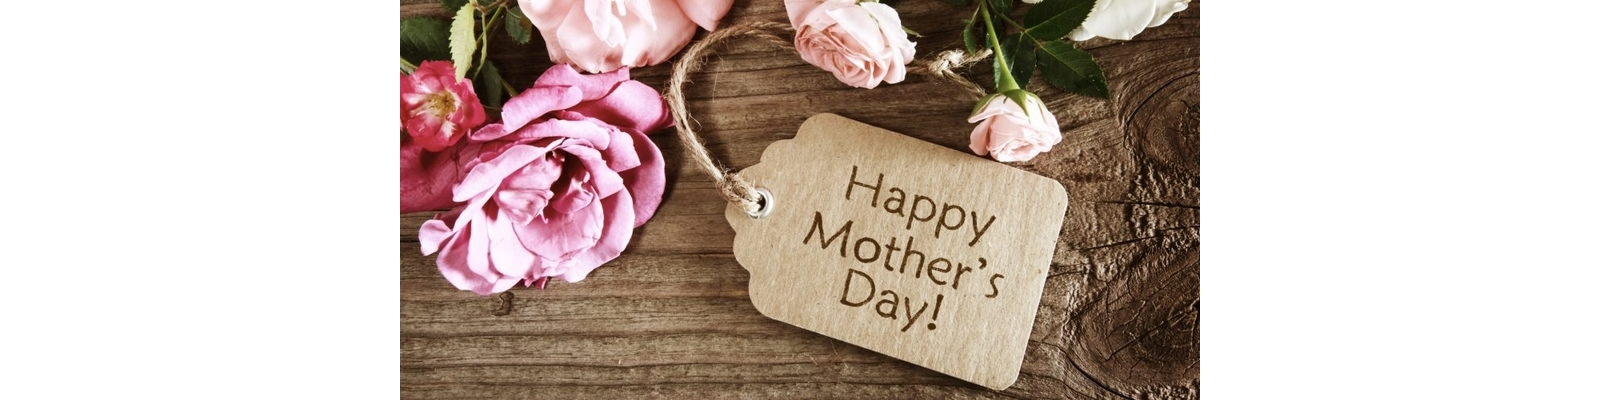 http://www.lakeshorecountryclub.com/uploads/slides/876389_mothers-day-1000x500.jpg